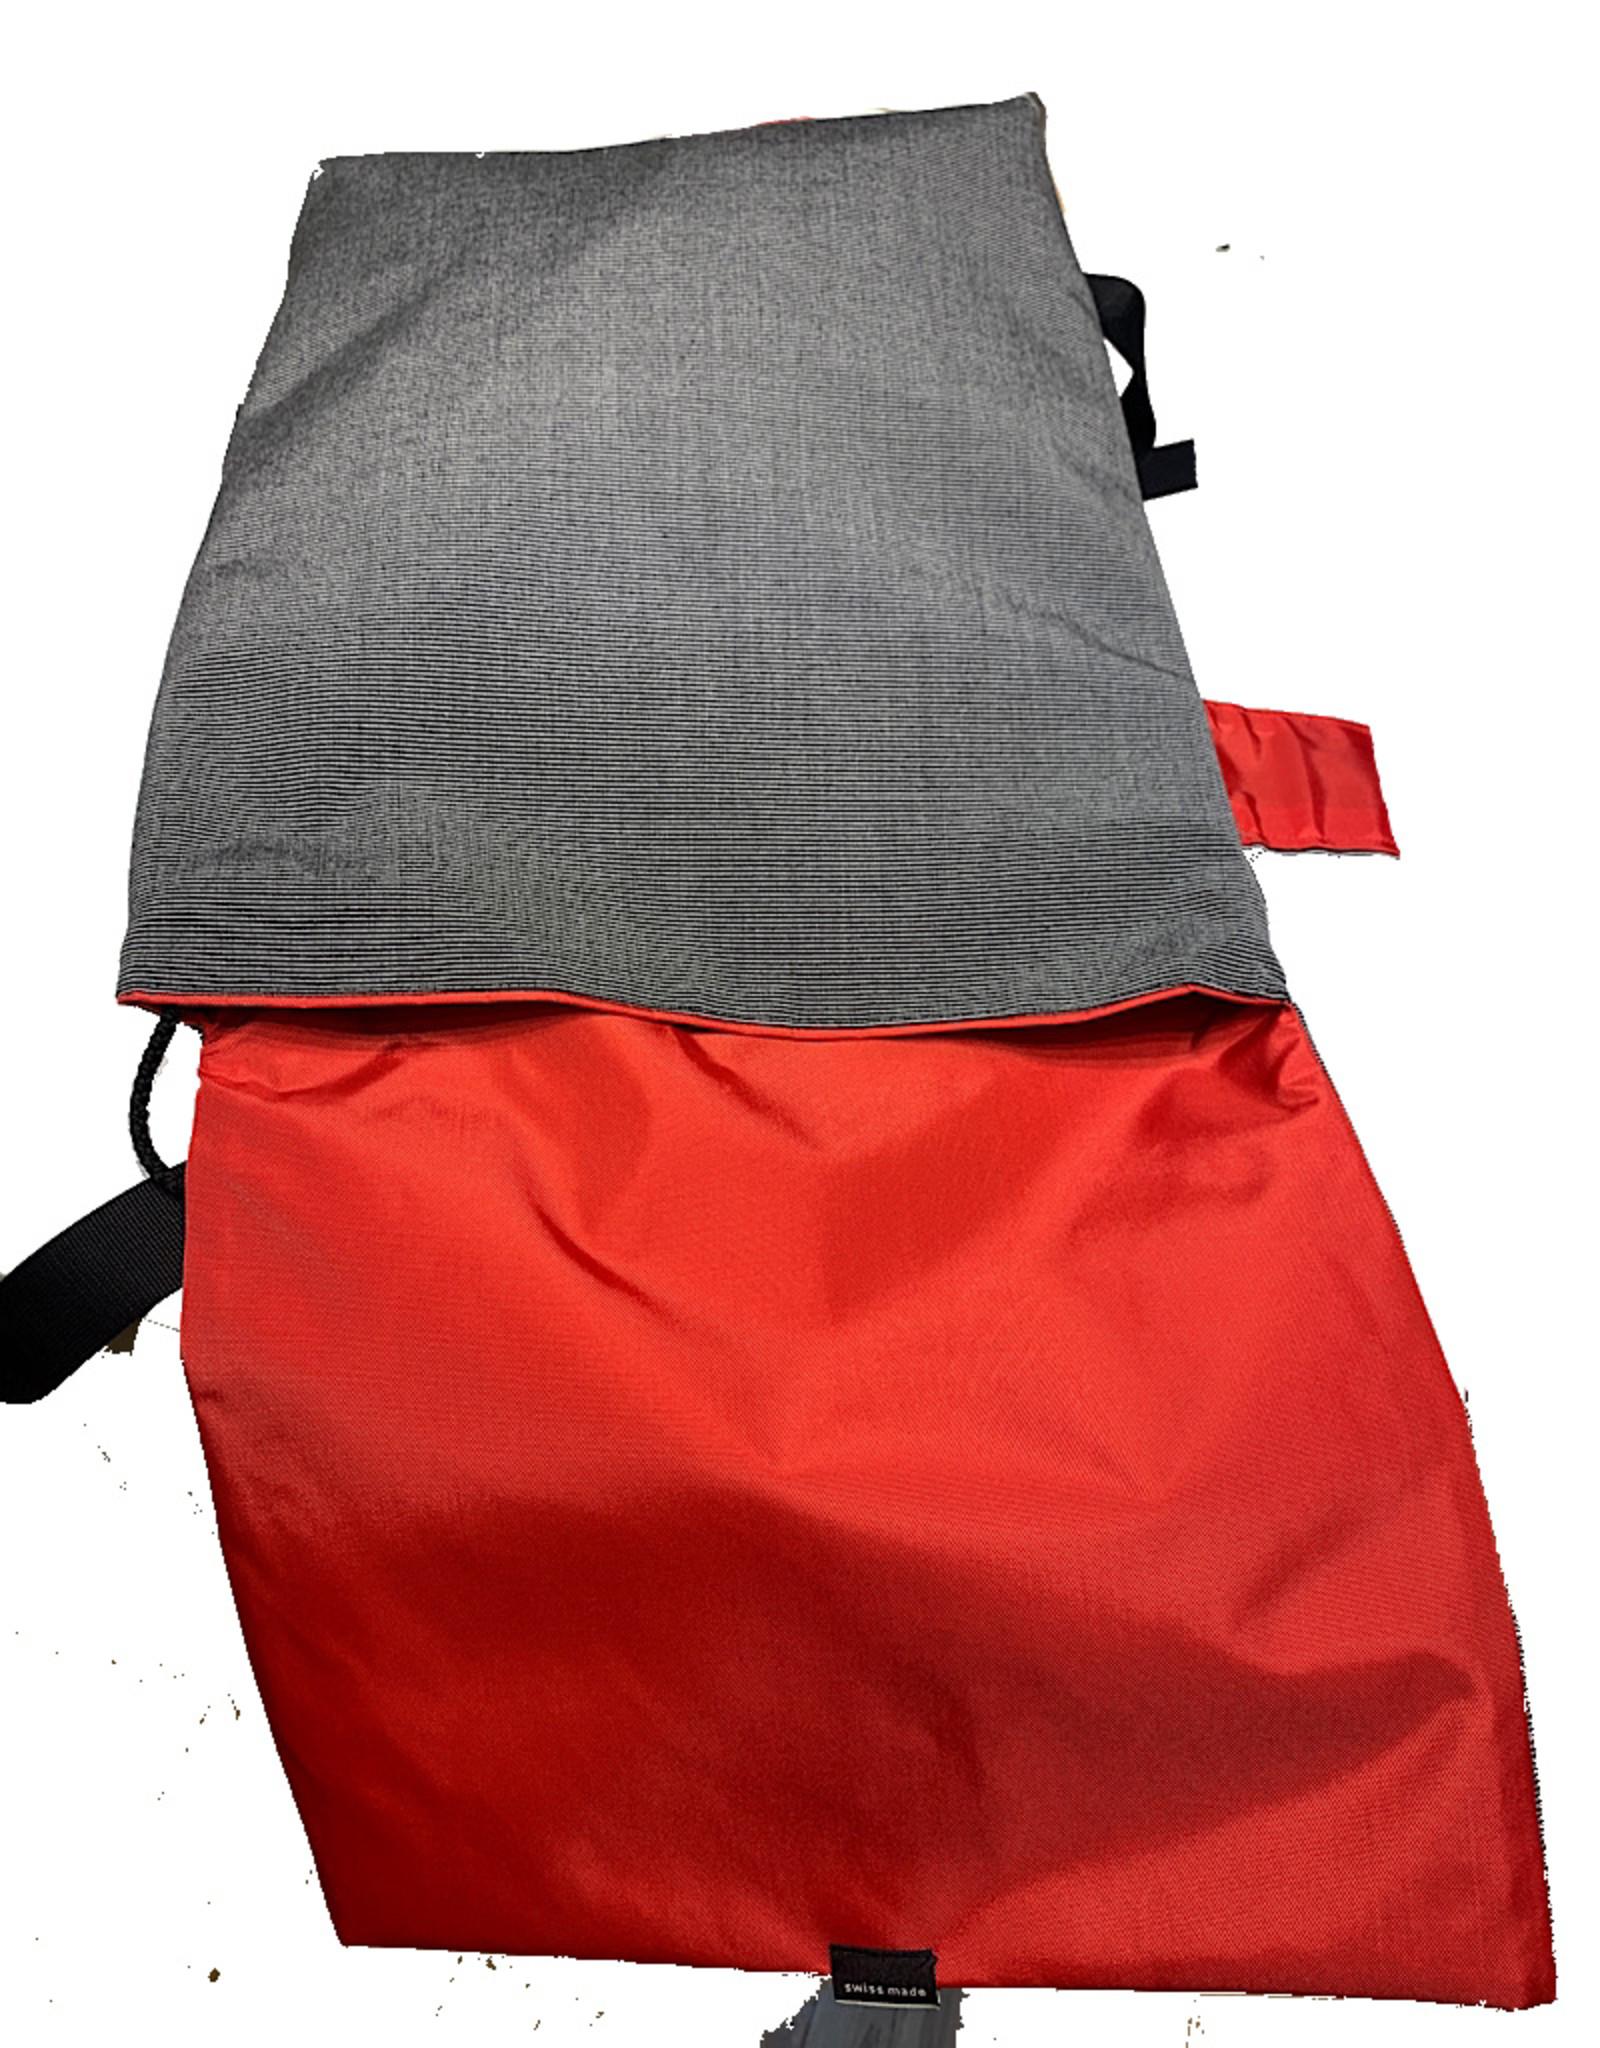 Lerski Rucksack Werd Hgrau / Rot Hgrau / Rot